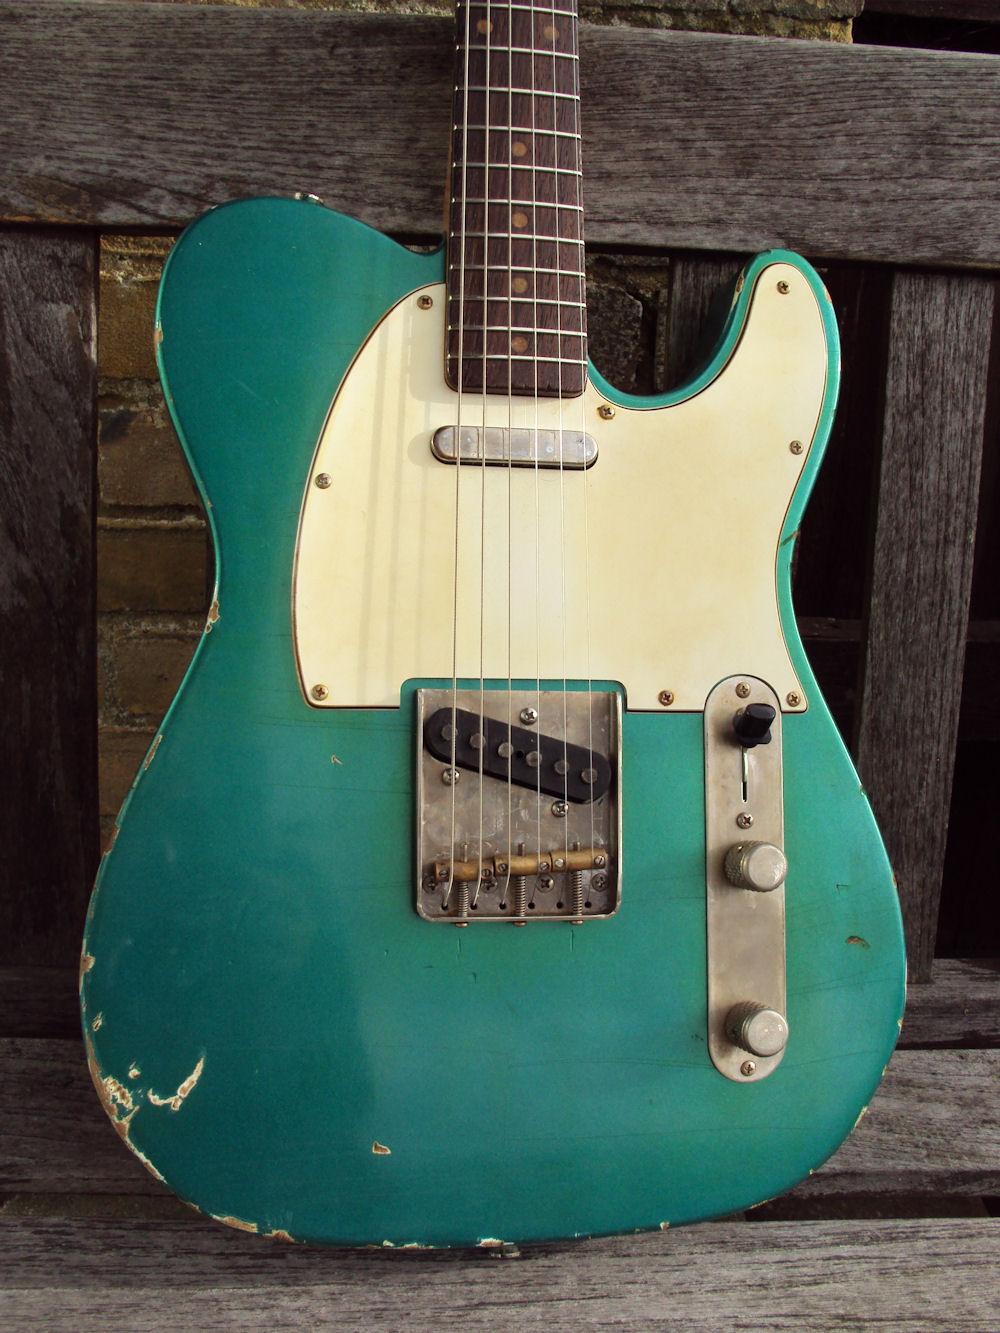 eternal guitars t type robin made to order 1960 39 s aged sherwood green guitar for sale eternal. Black Bedroom Furniture Sets. Home Design Ideas